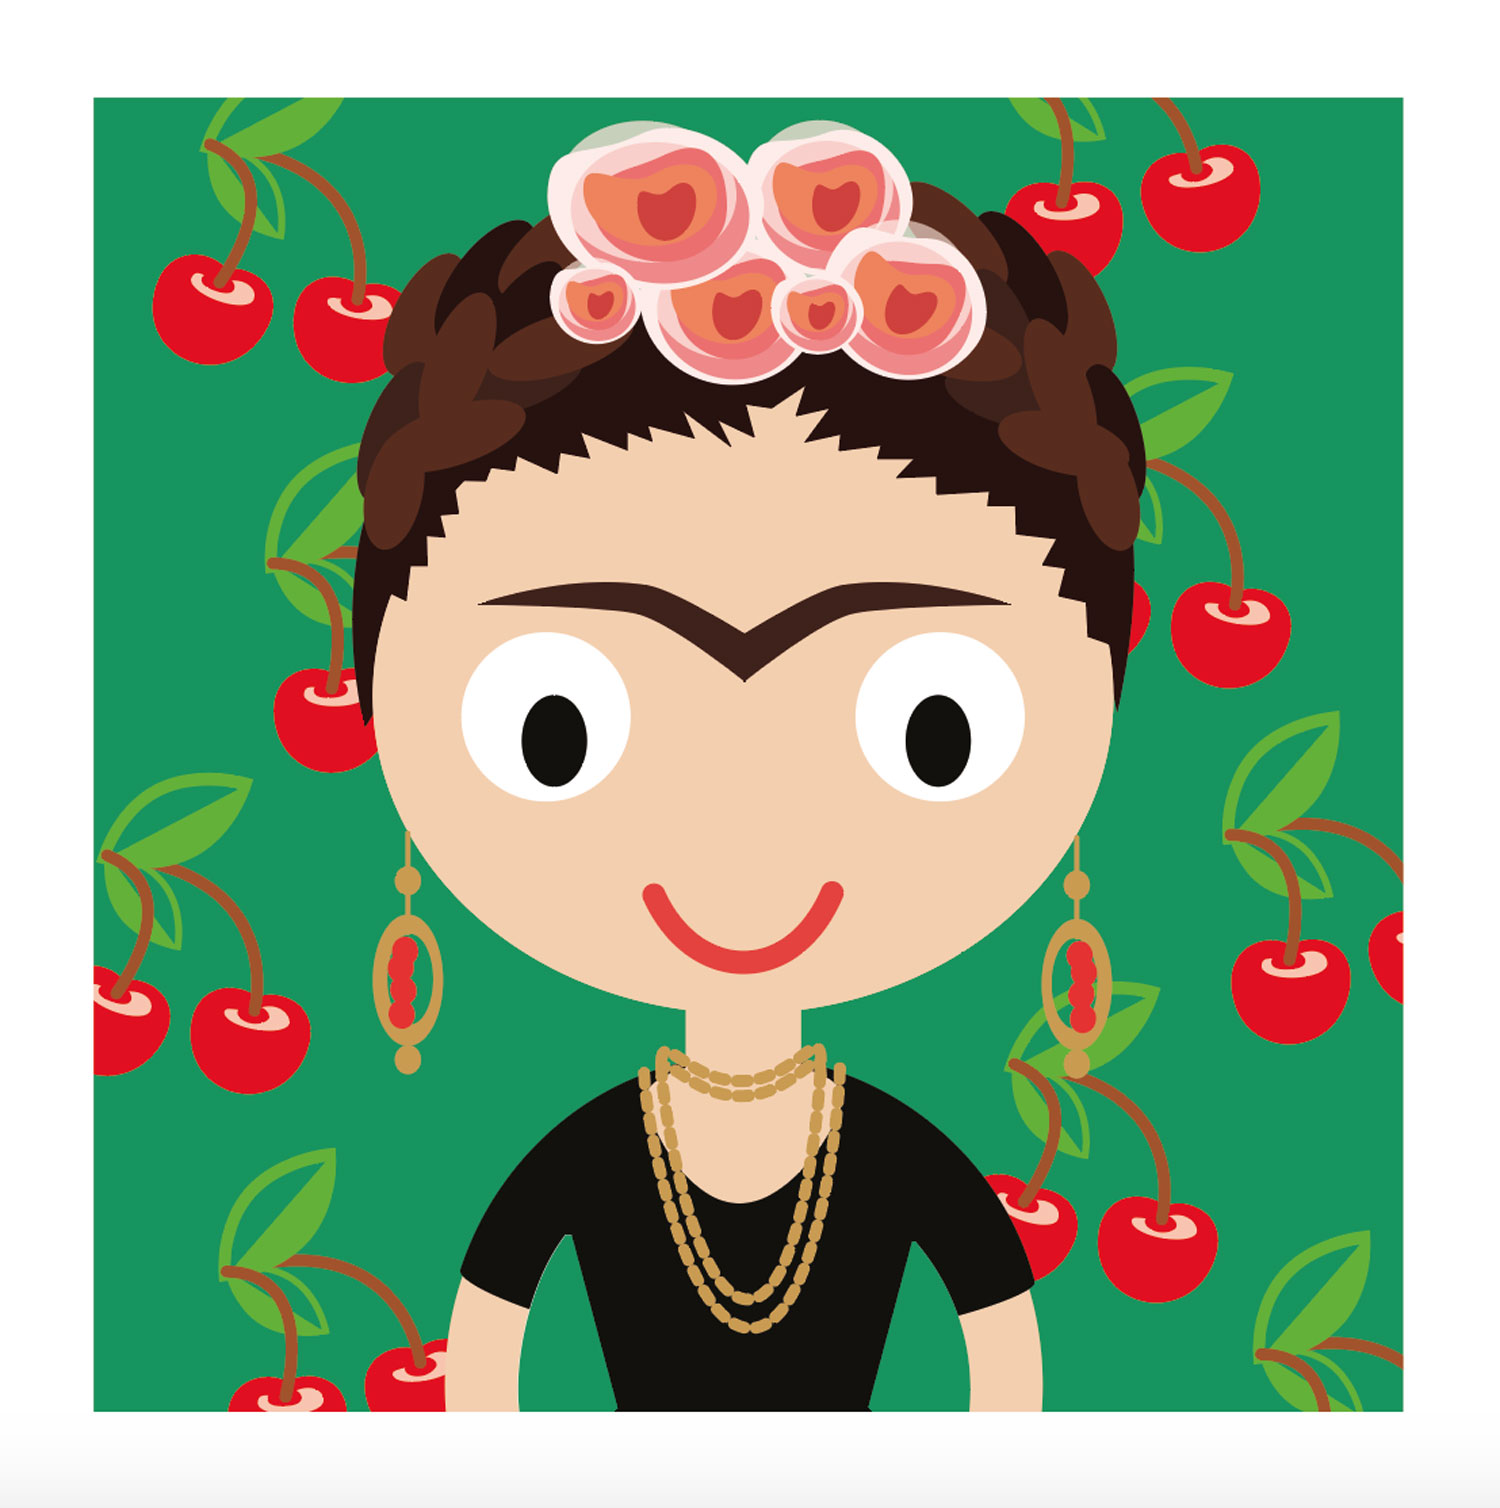 frida-kahlo-illustration.jpg